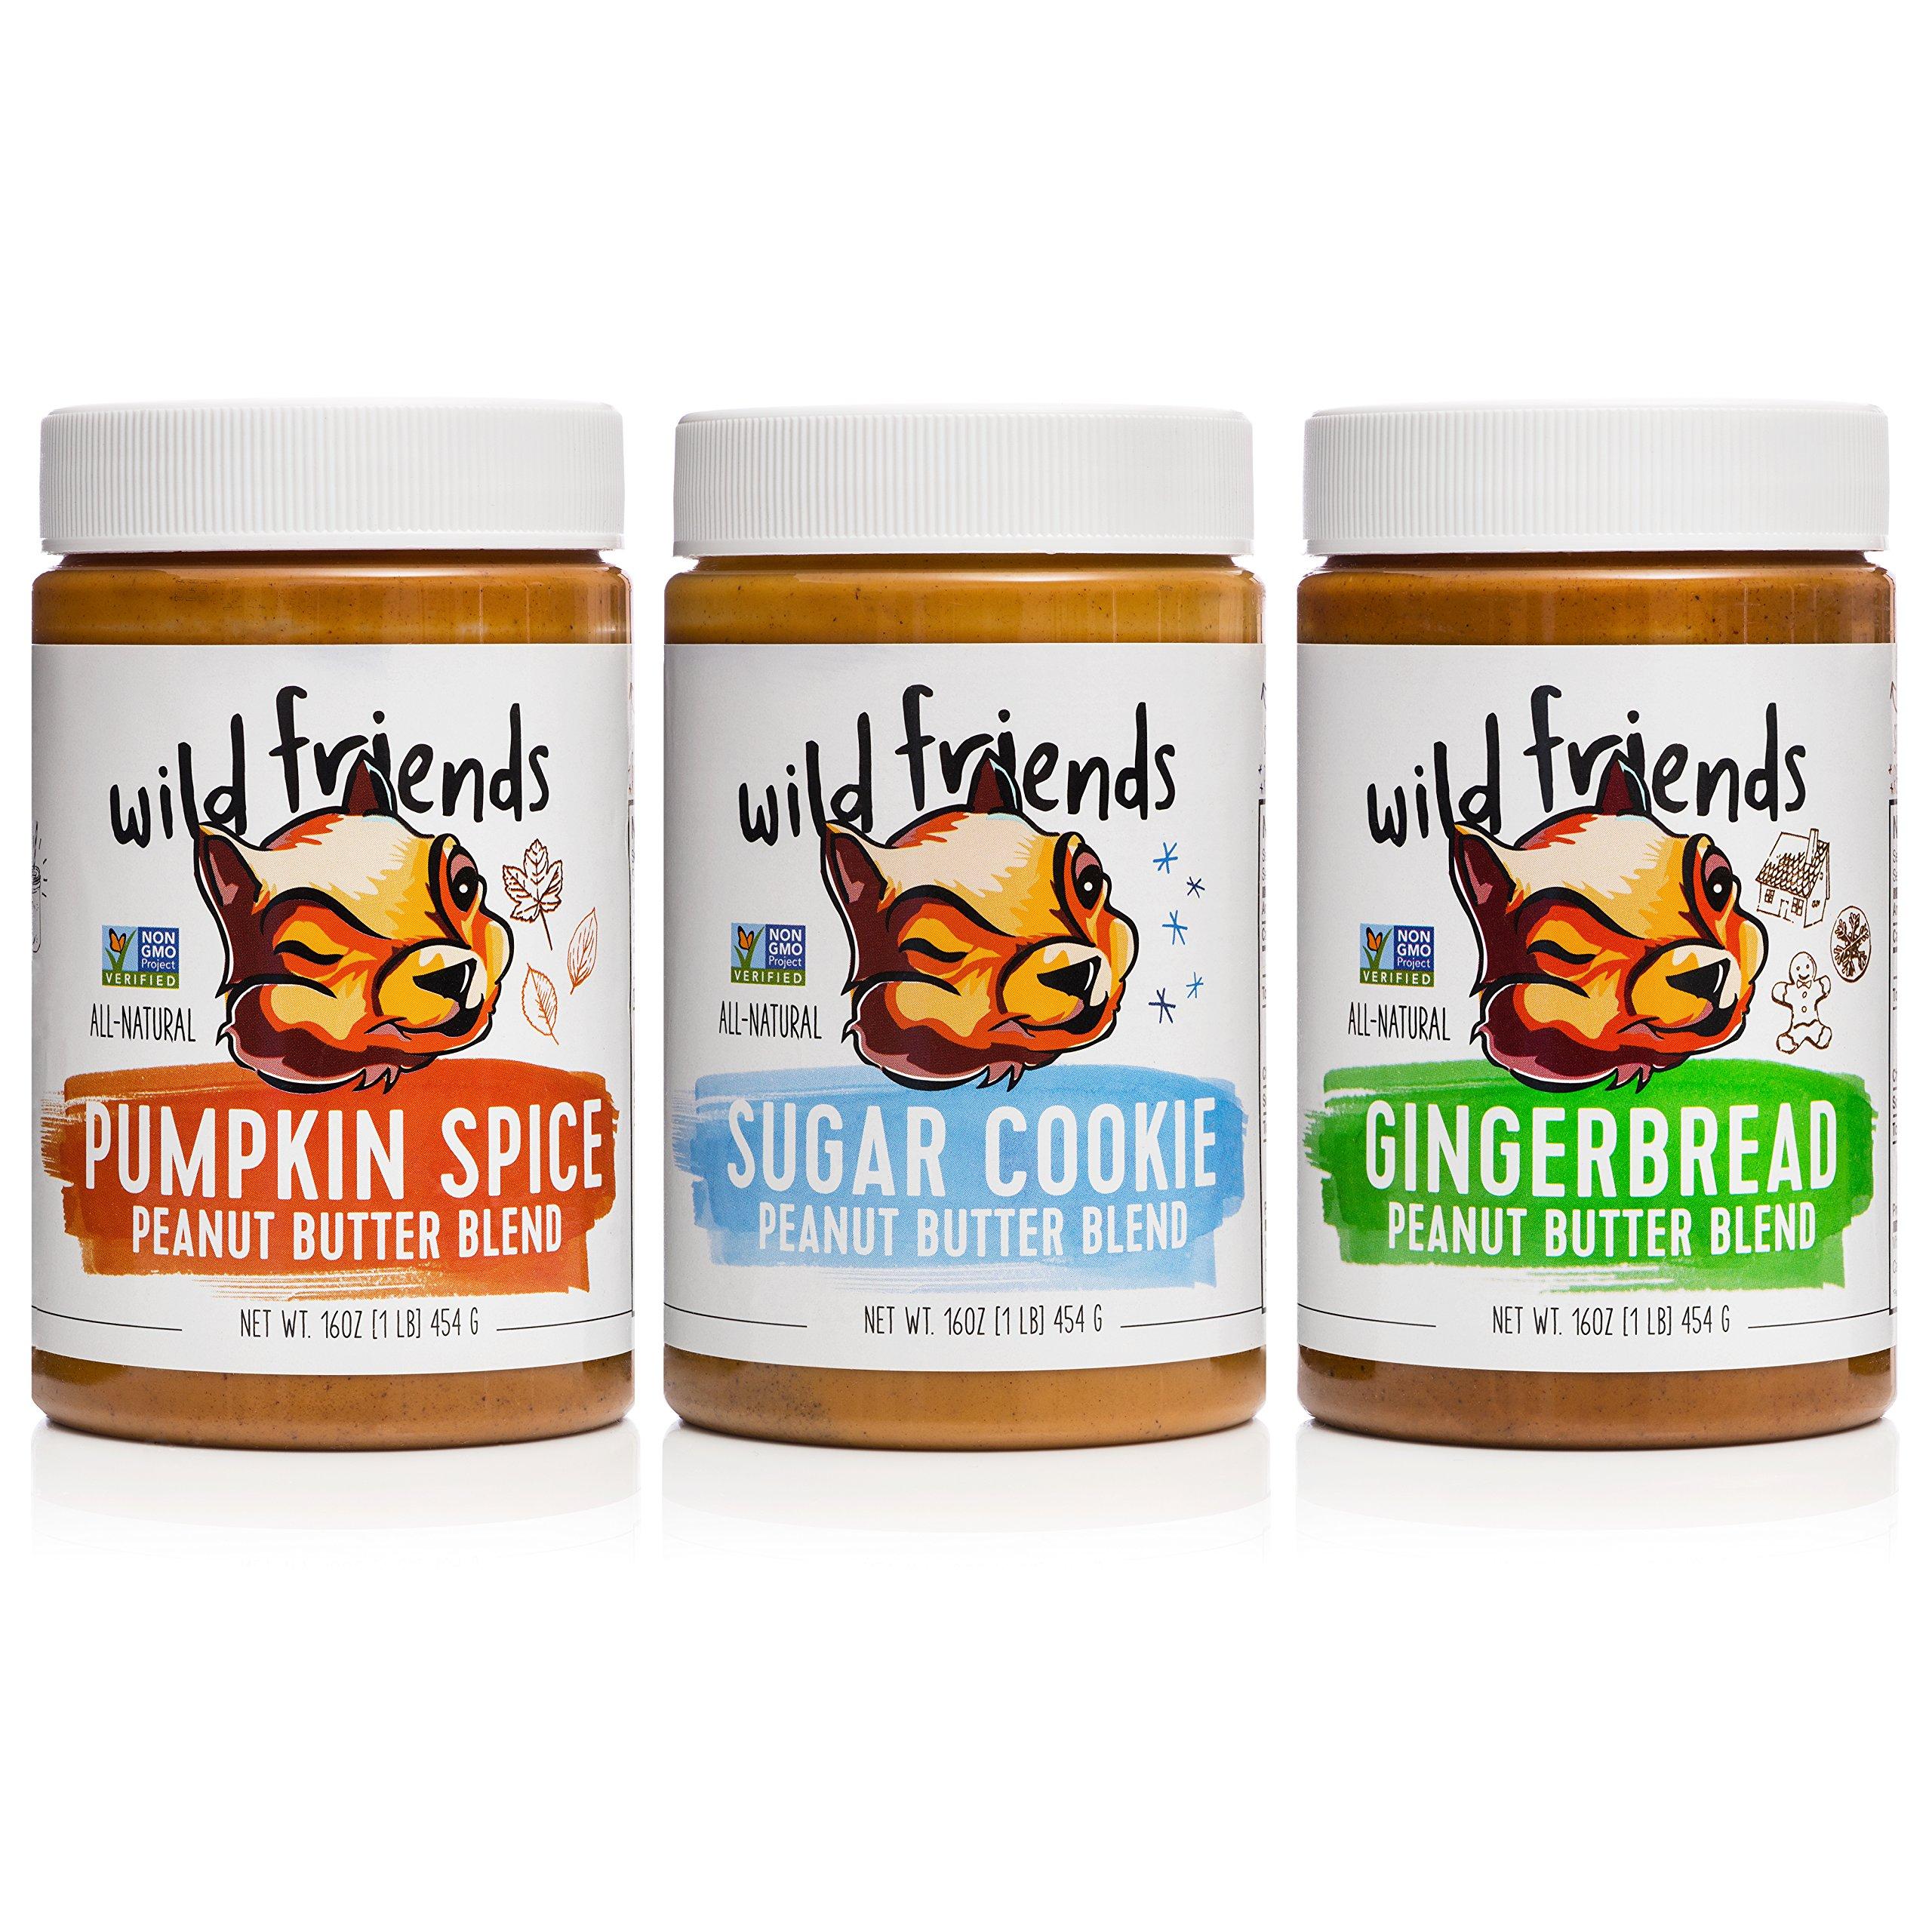 All-Natural Peanut Butter Variety Pack, Seasonal, Pumpkin Spice, Sugar Cookie & Gingerbread